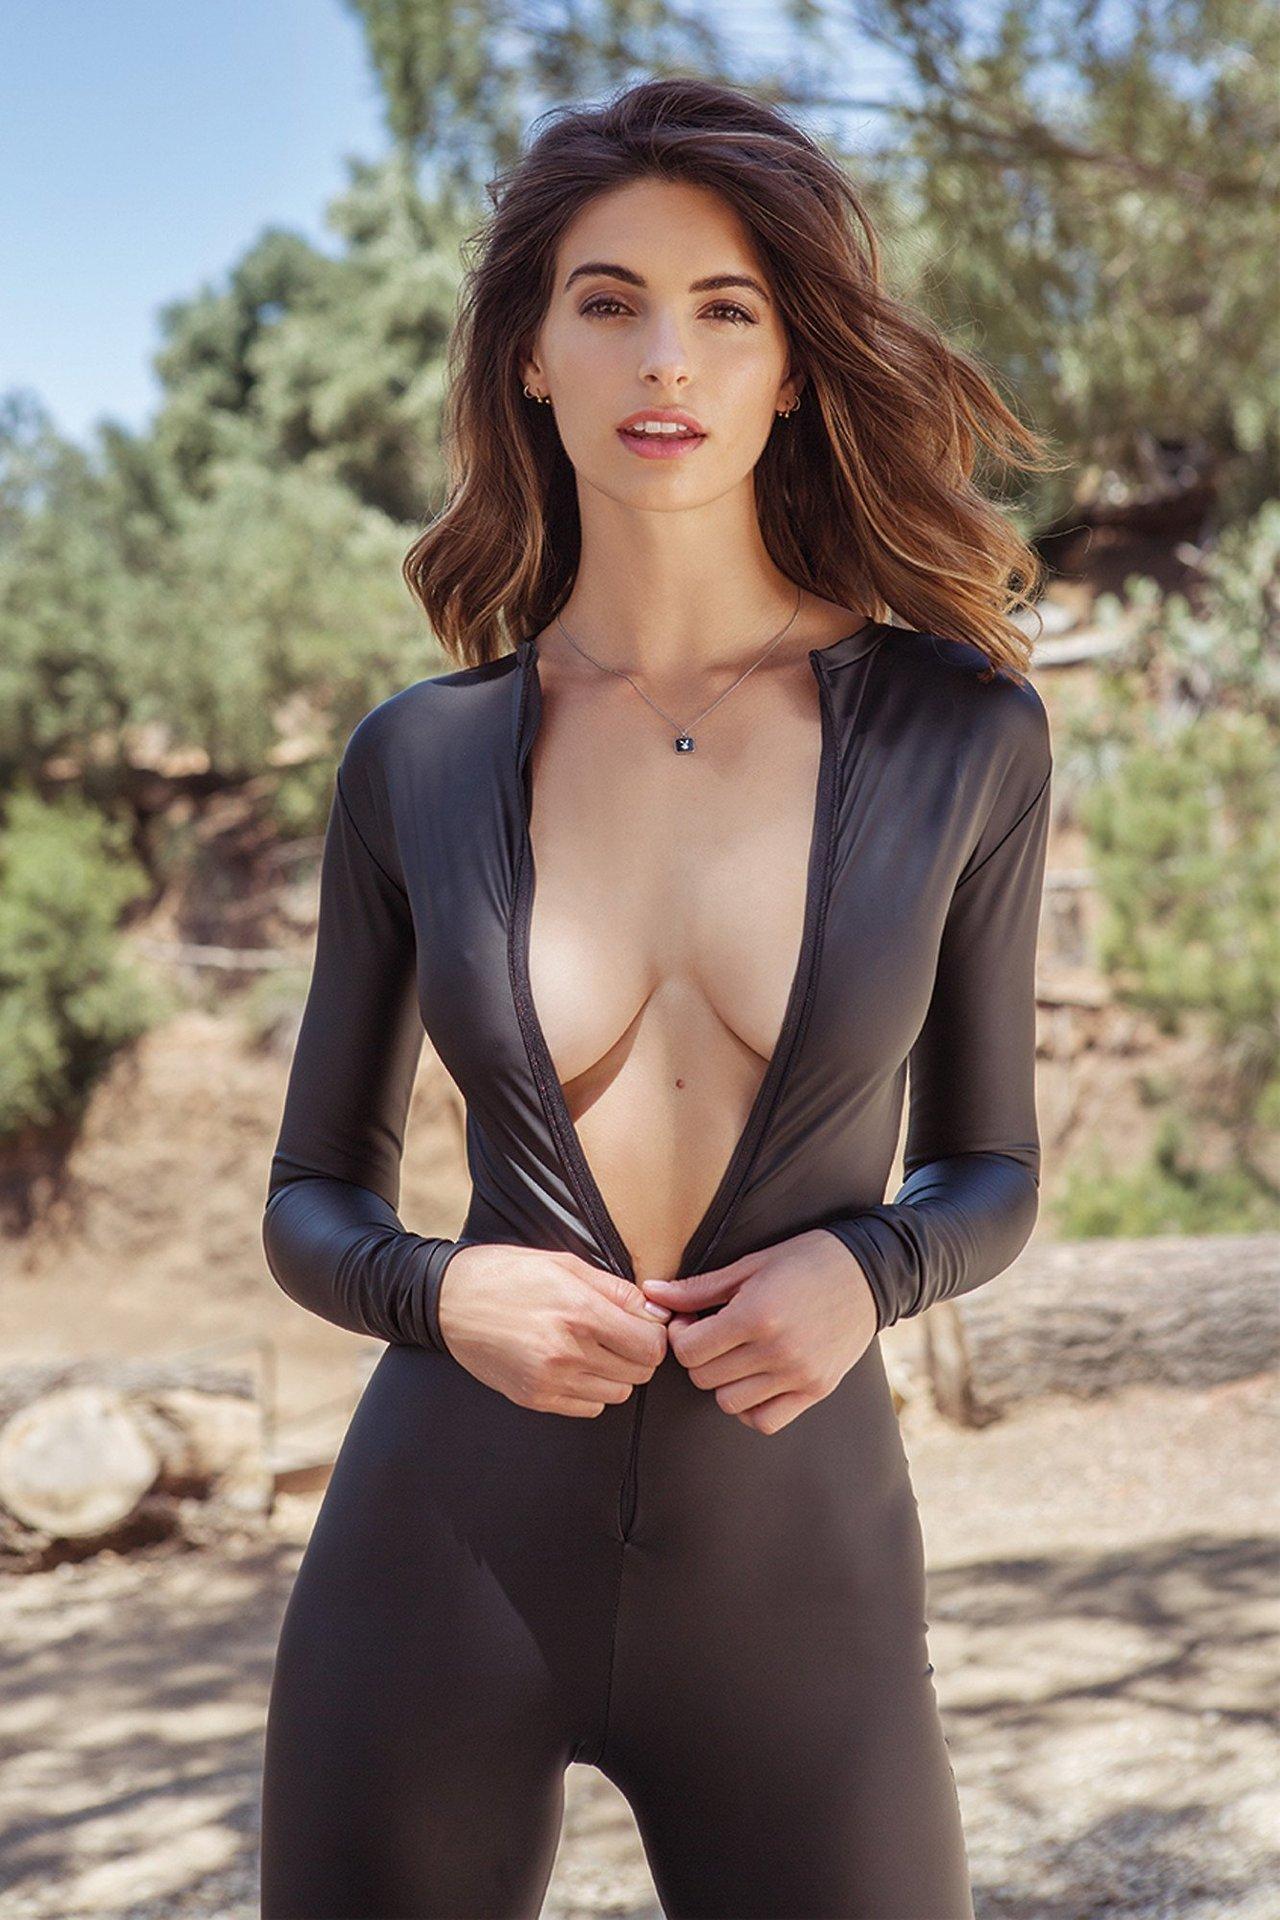 Pictures Elisabeth Giolito nudes (23 photos), Ass, Bikini, Feet, legs 2019